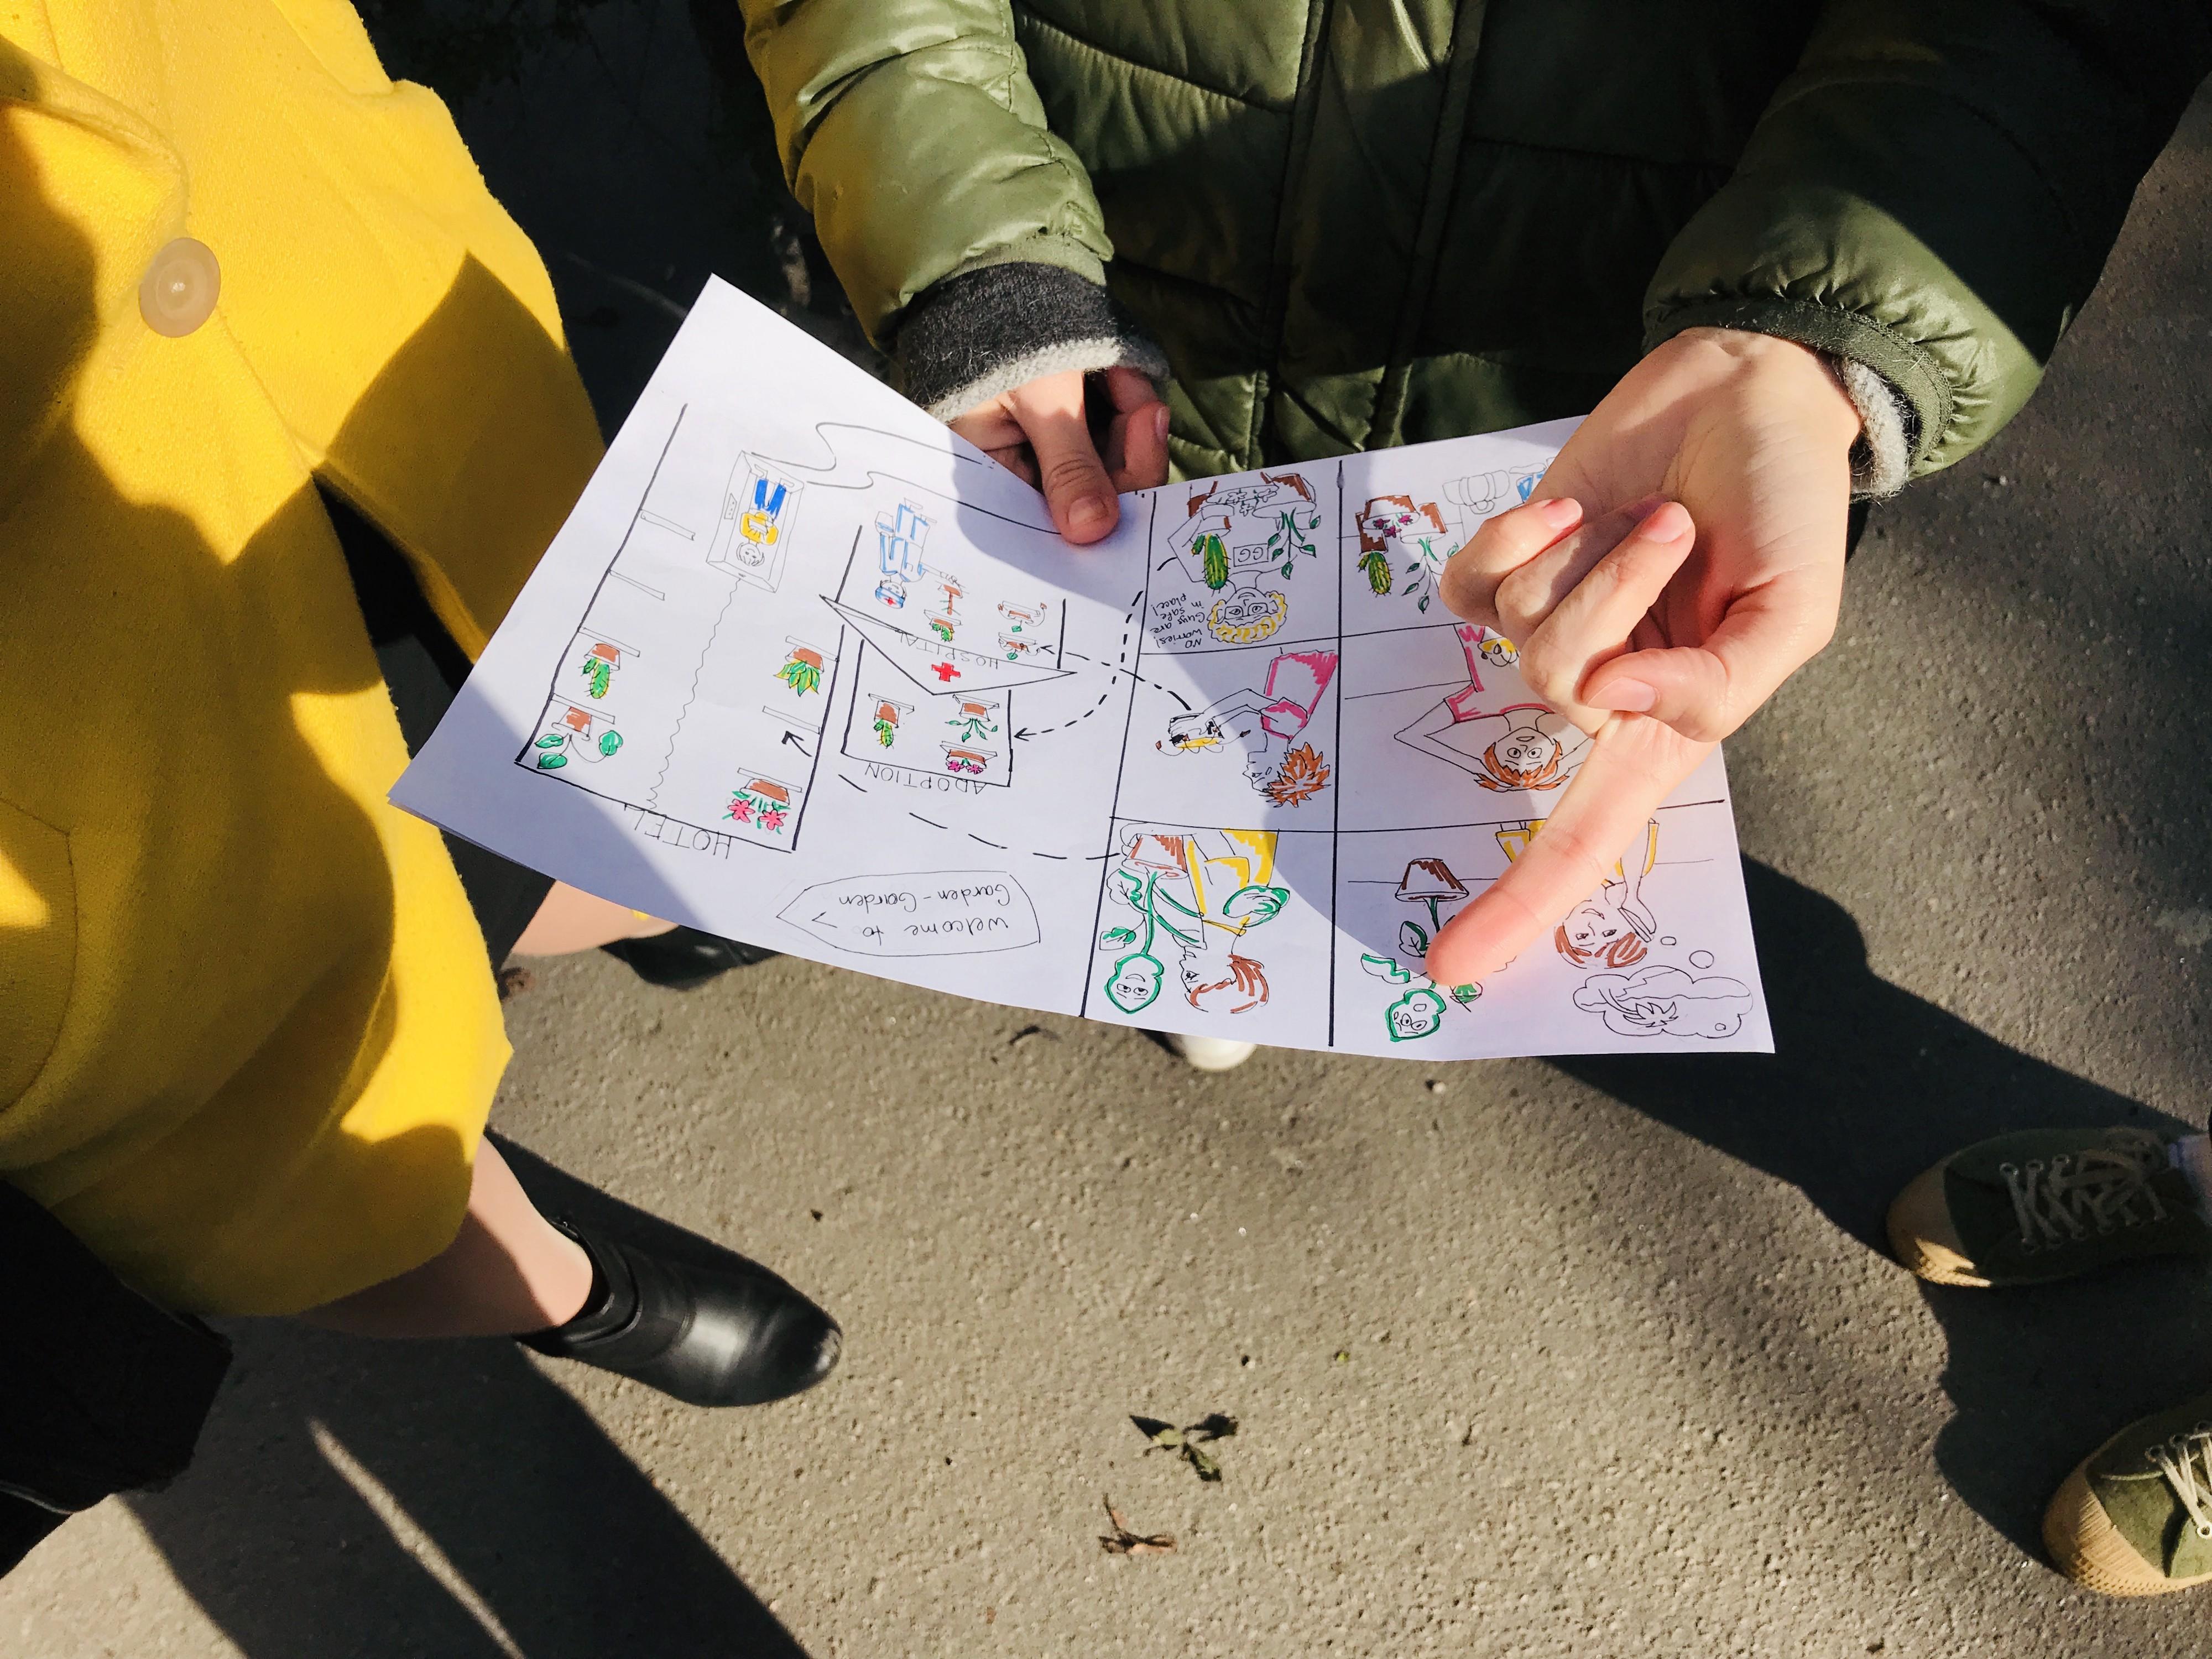 Making Tallinn Healthier through Interaction Design